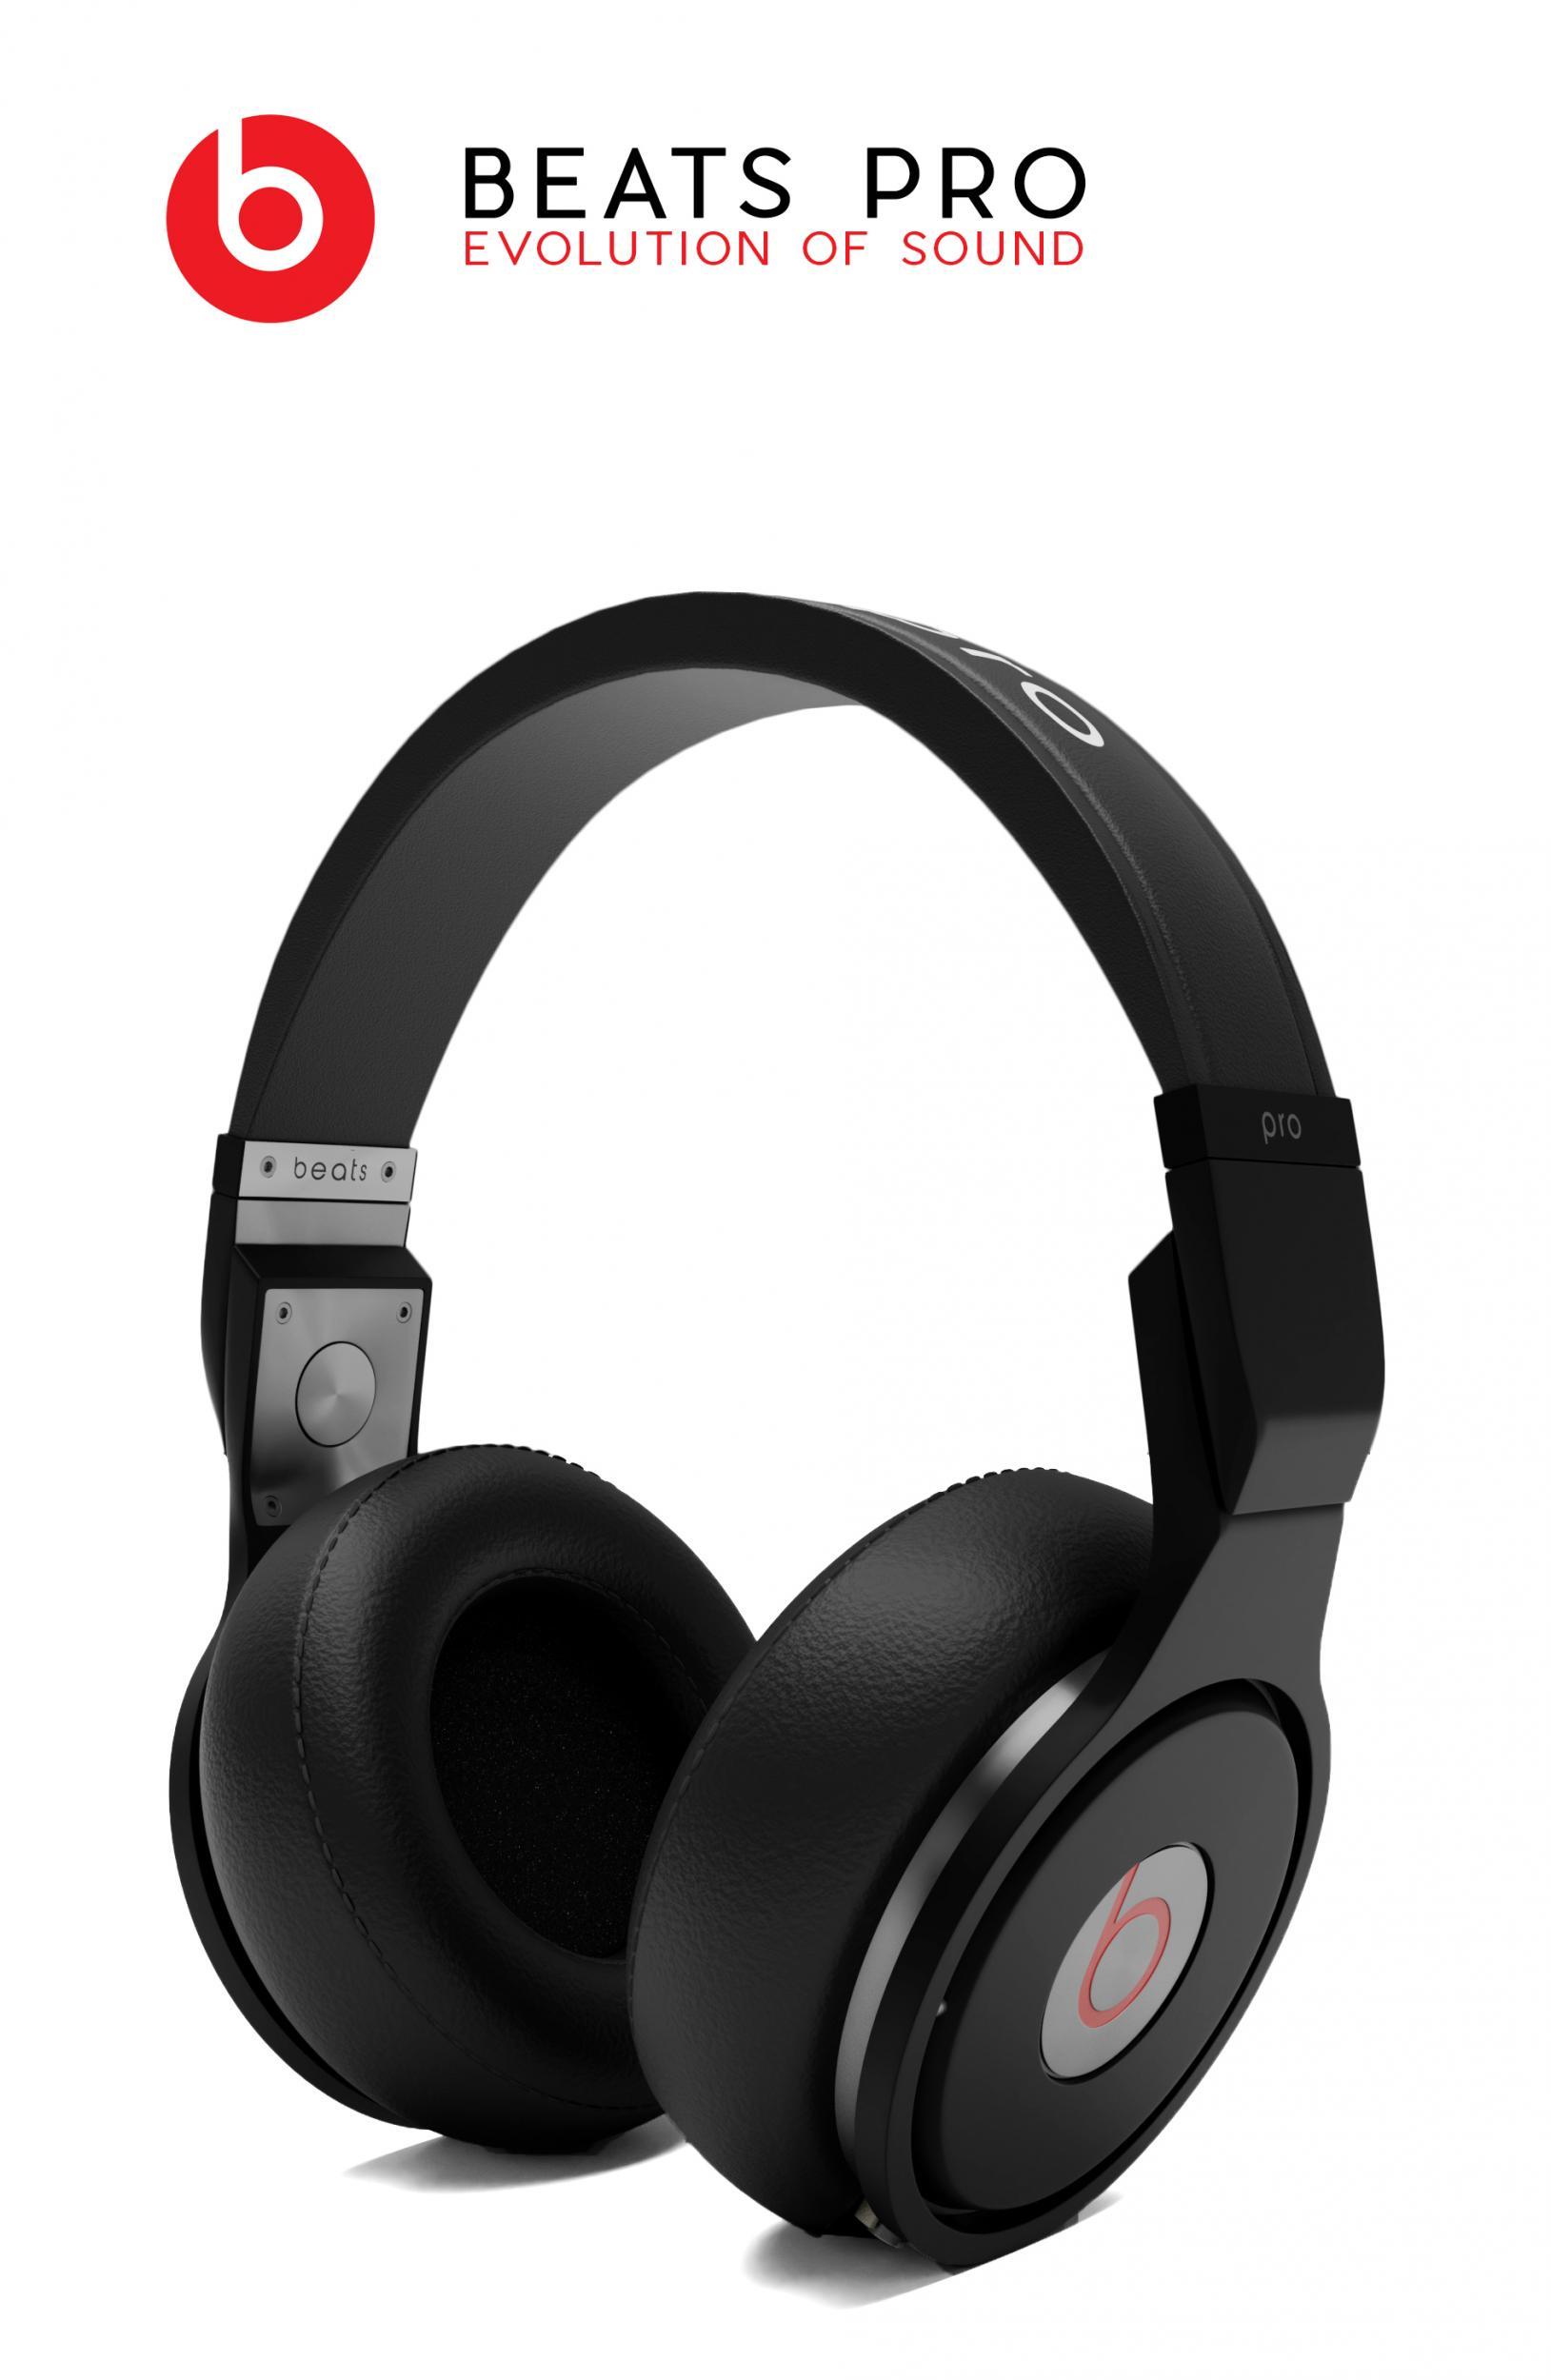 Beats-Pro-Cam01.thumb.jpg.571f927119be1e25408b2da3e7d9697d.jpg